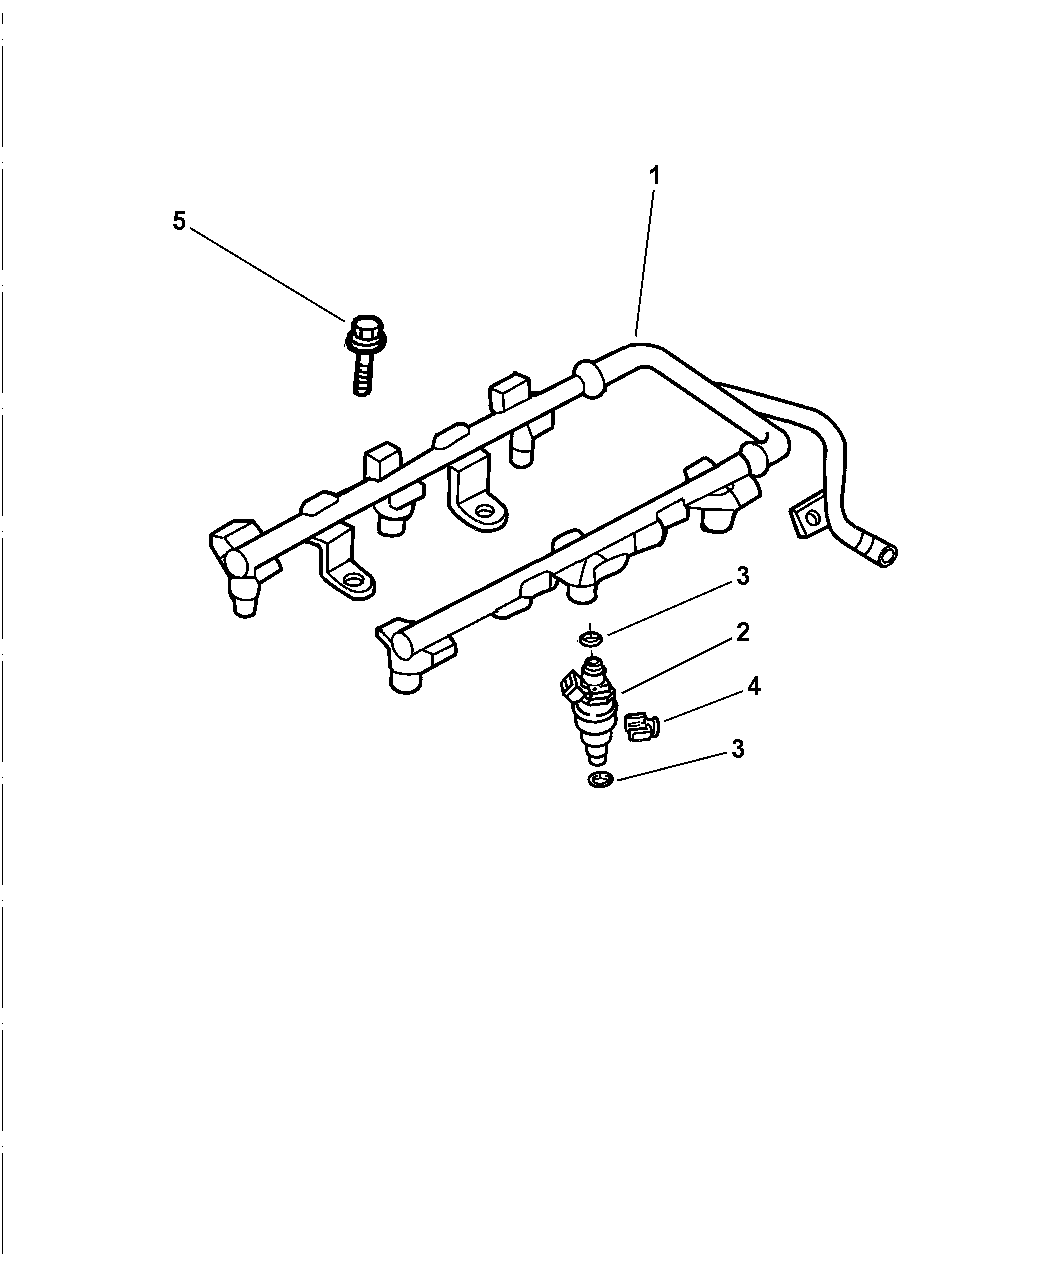 2004 Dodge Intrepid Fuel Rail